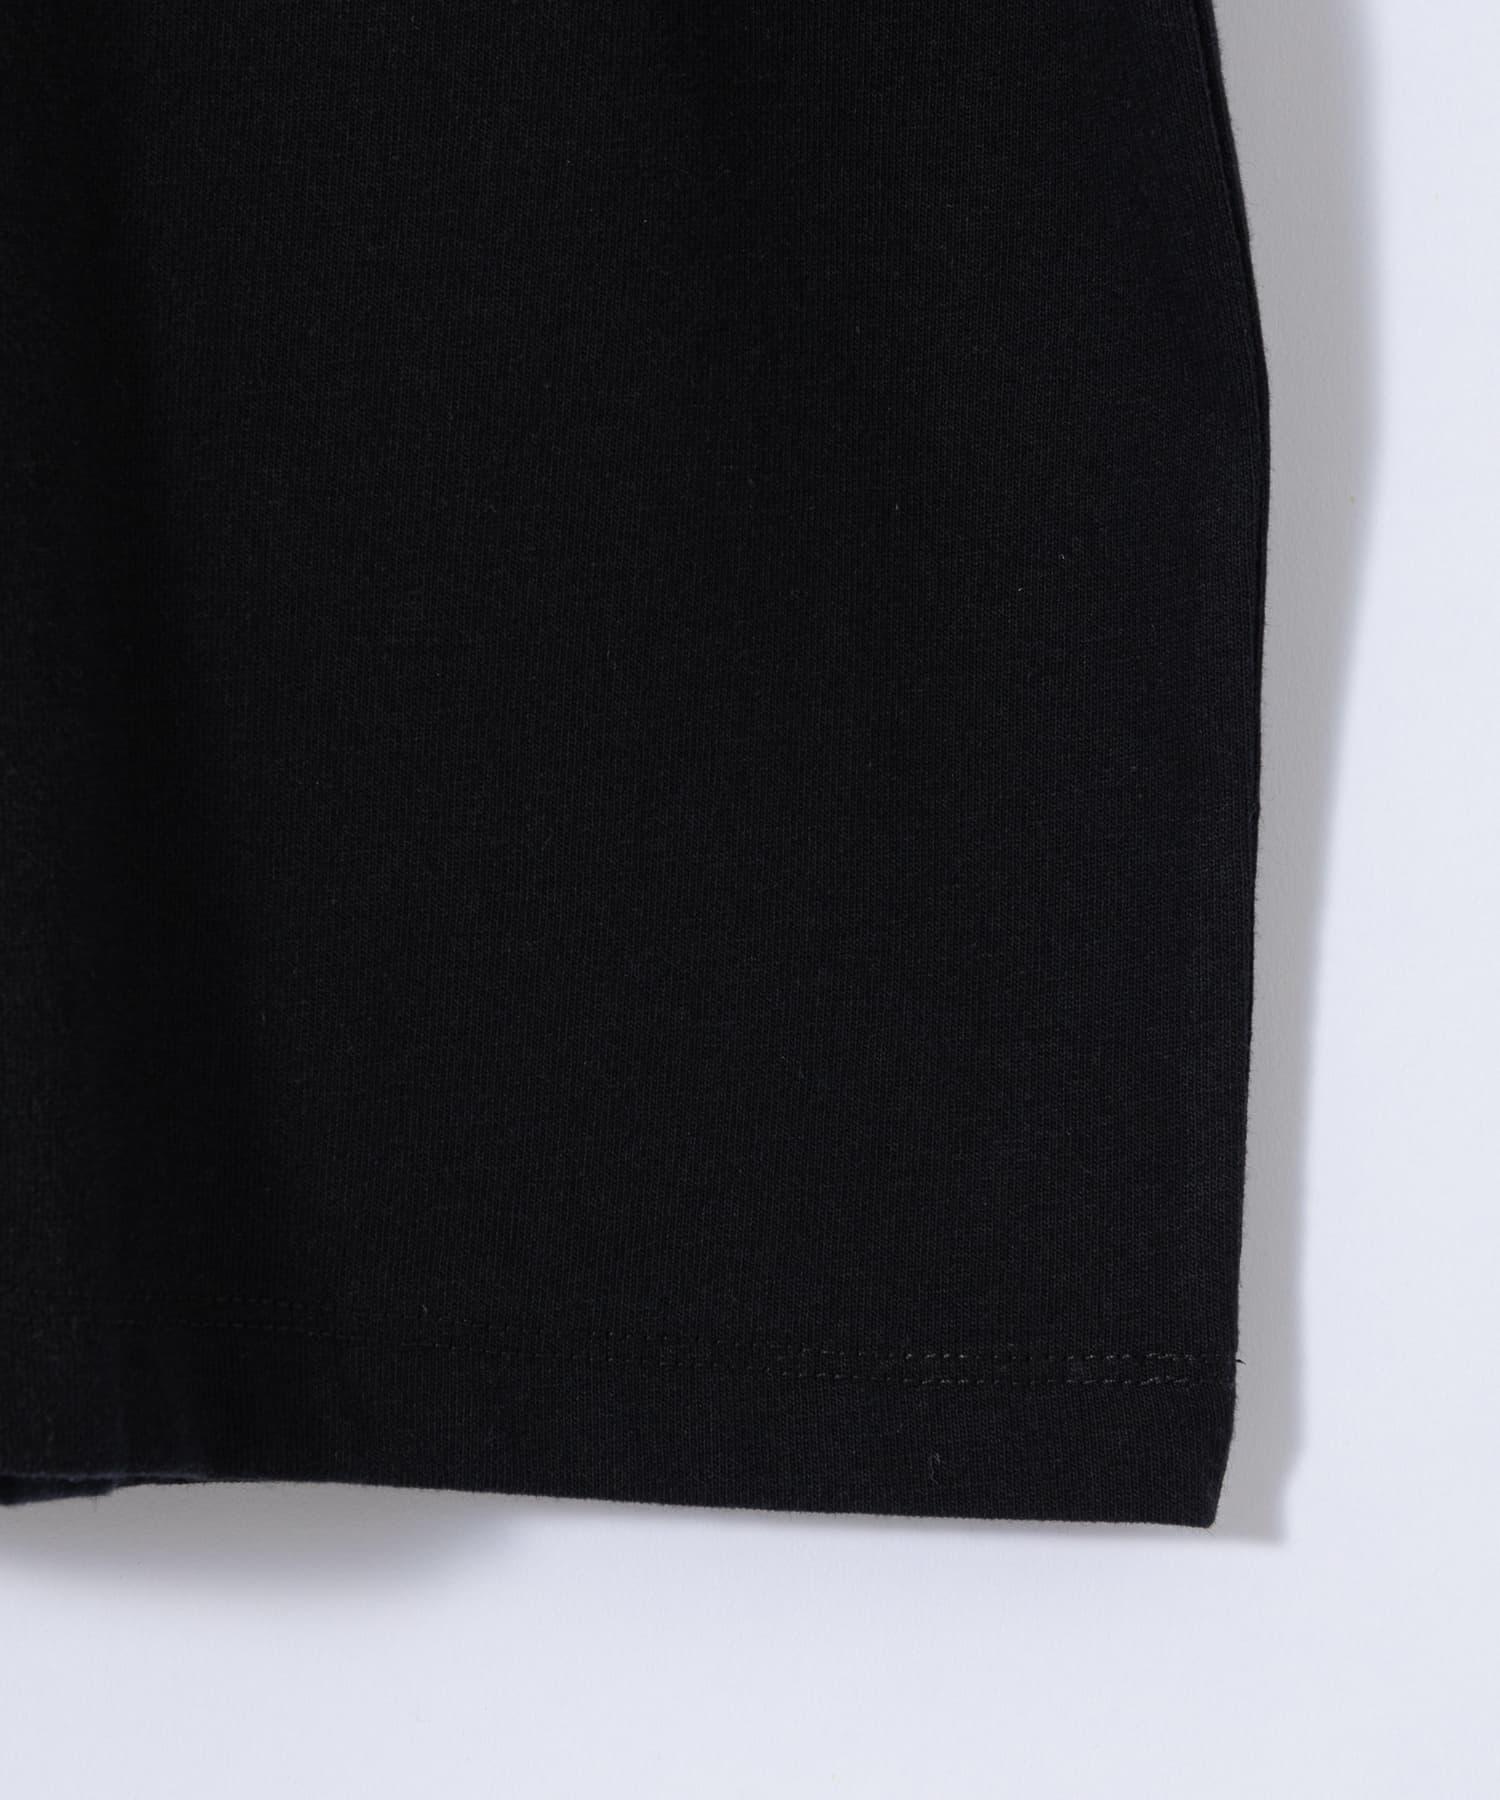 CIAOPANIC(チャオパニック) 【U.S. POLO ASSN. /ユーエスポロアッスン】別注ワンポイント刺繍ロンT